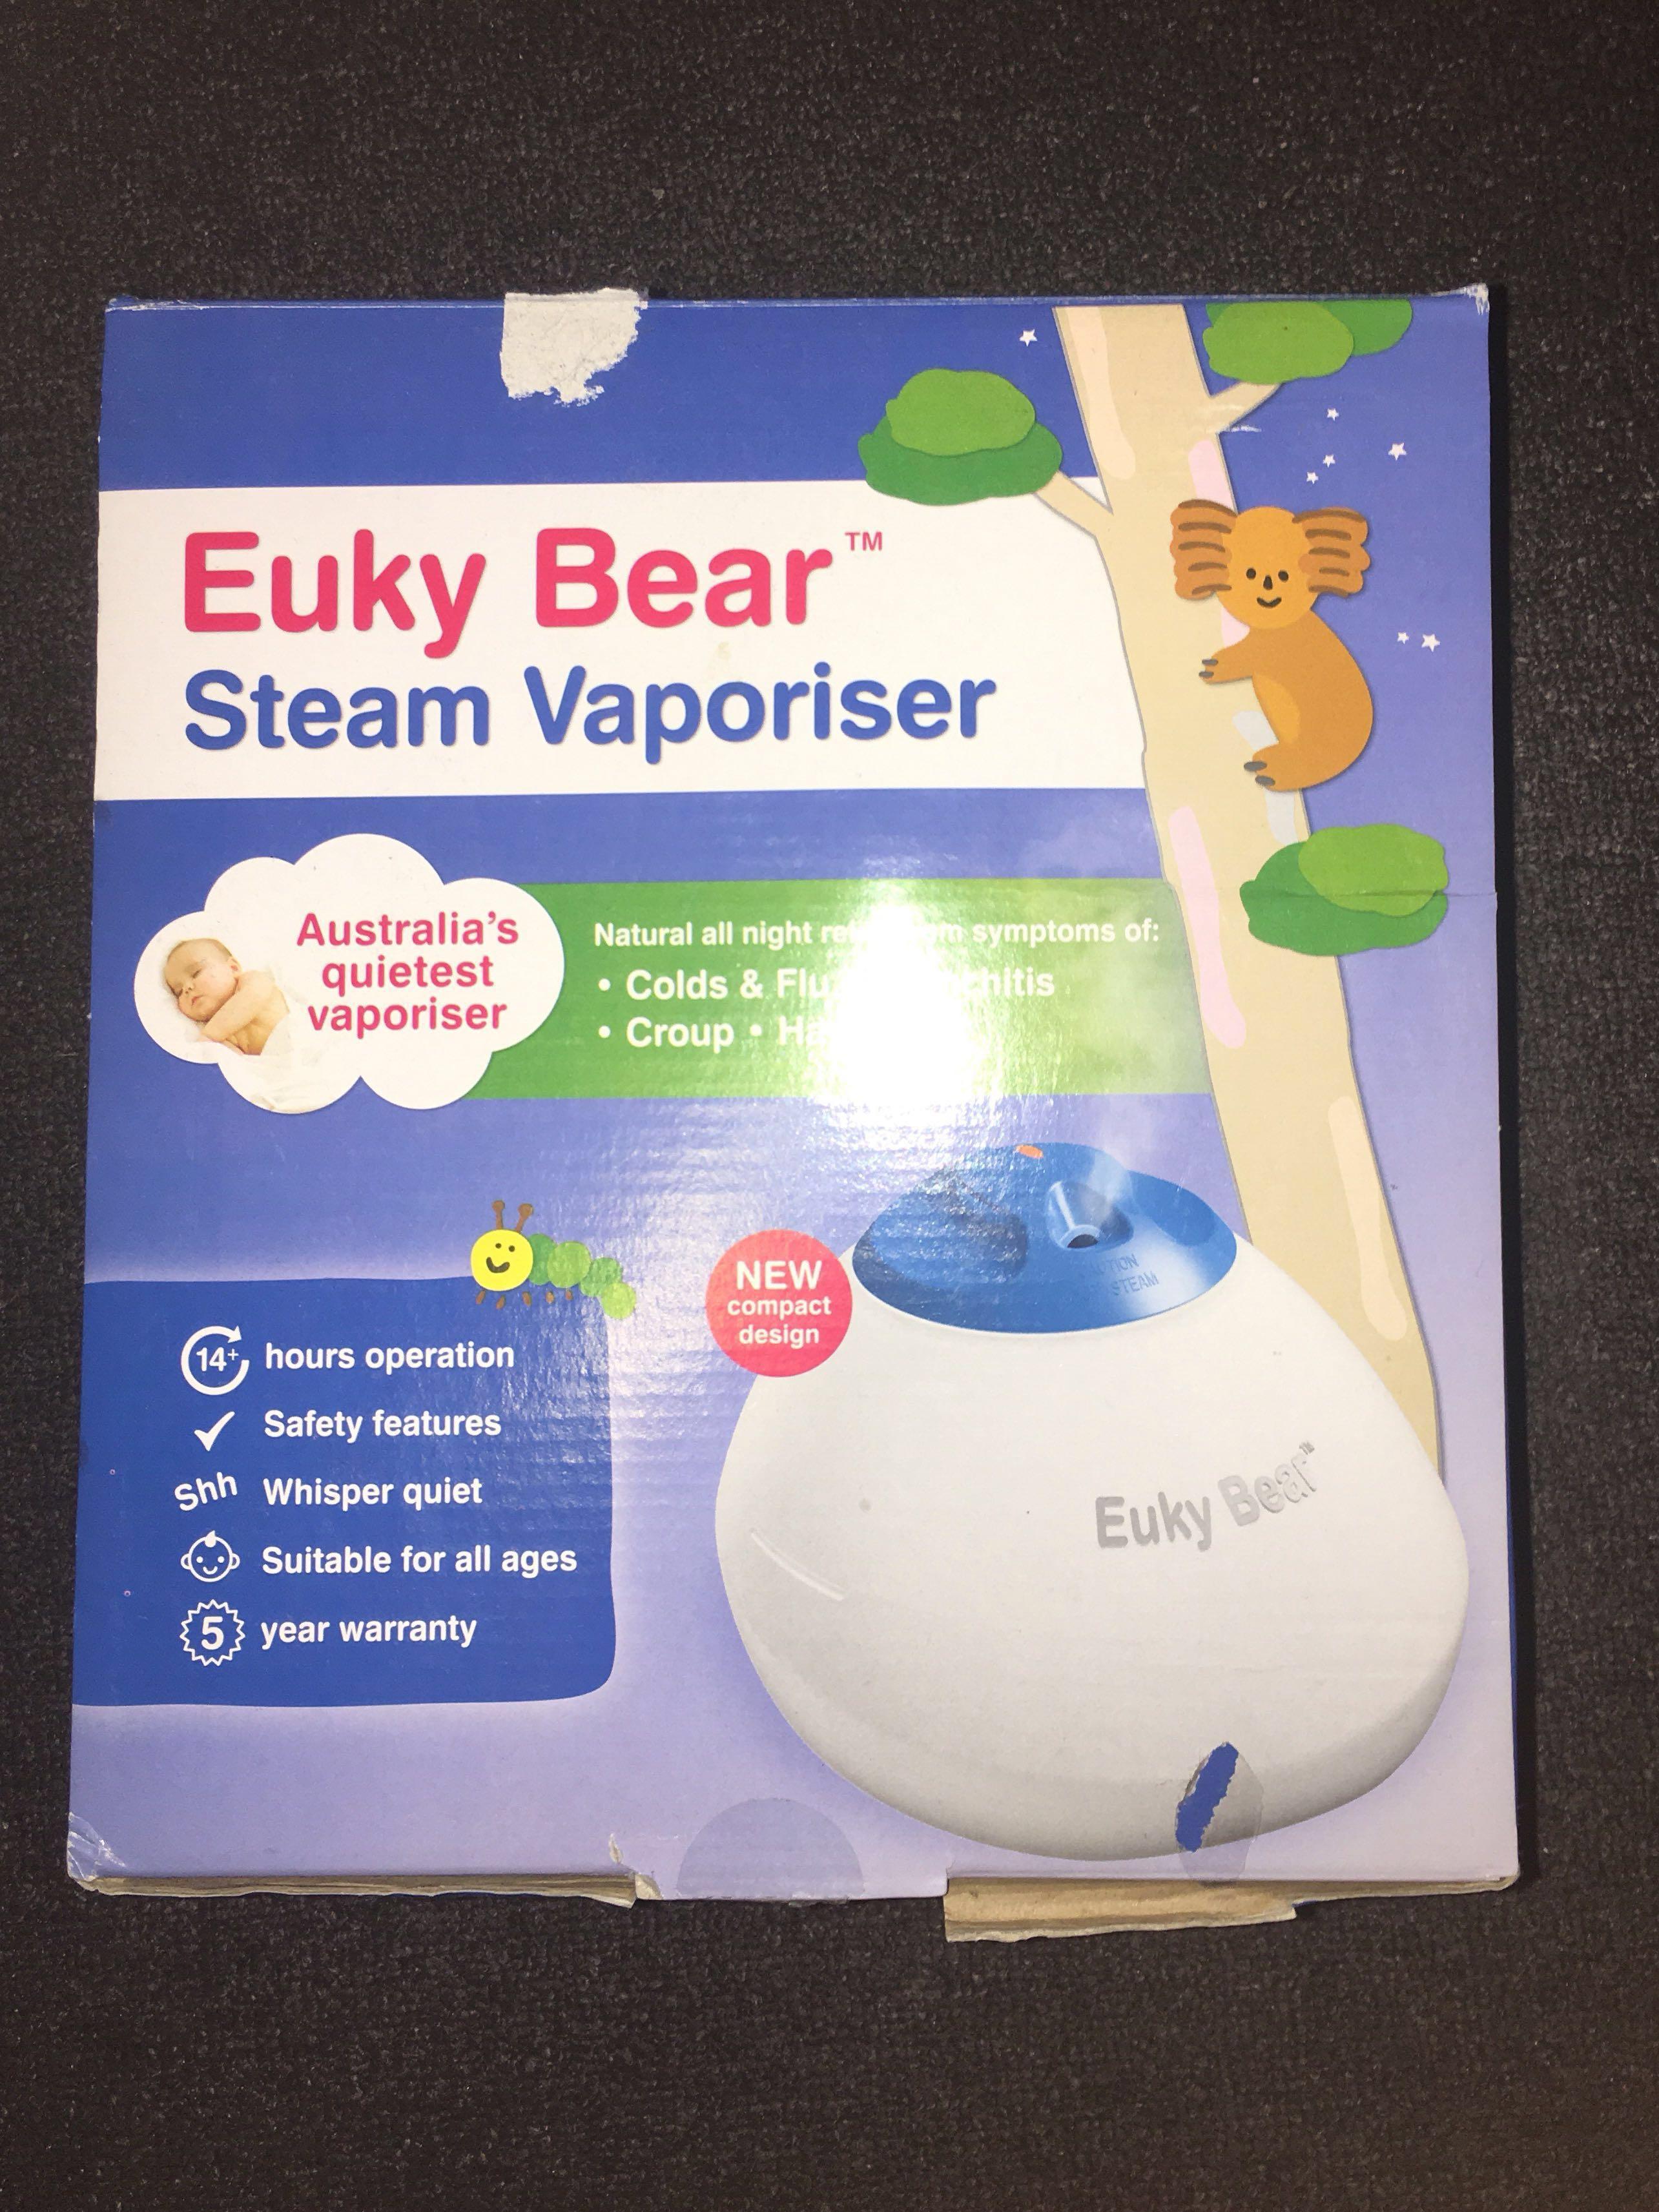 Euky Bear Steam Vaporiser - RRP $69.95